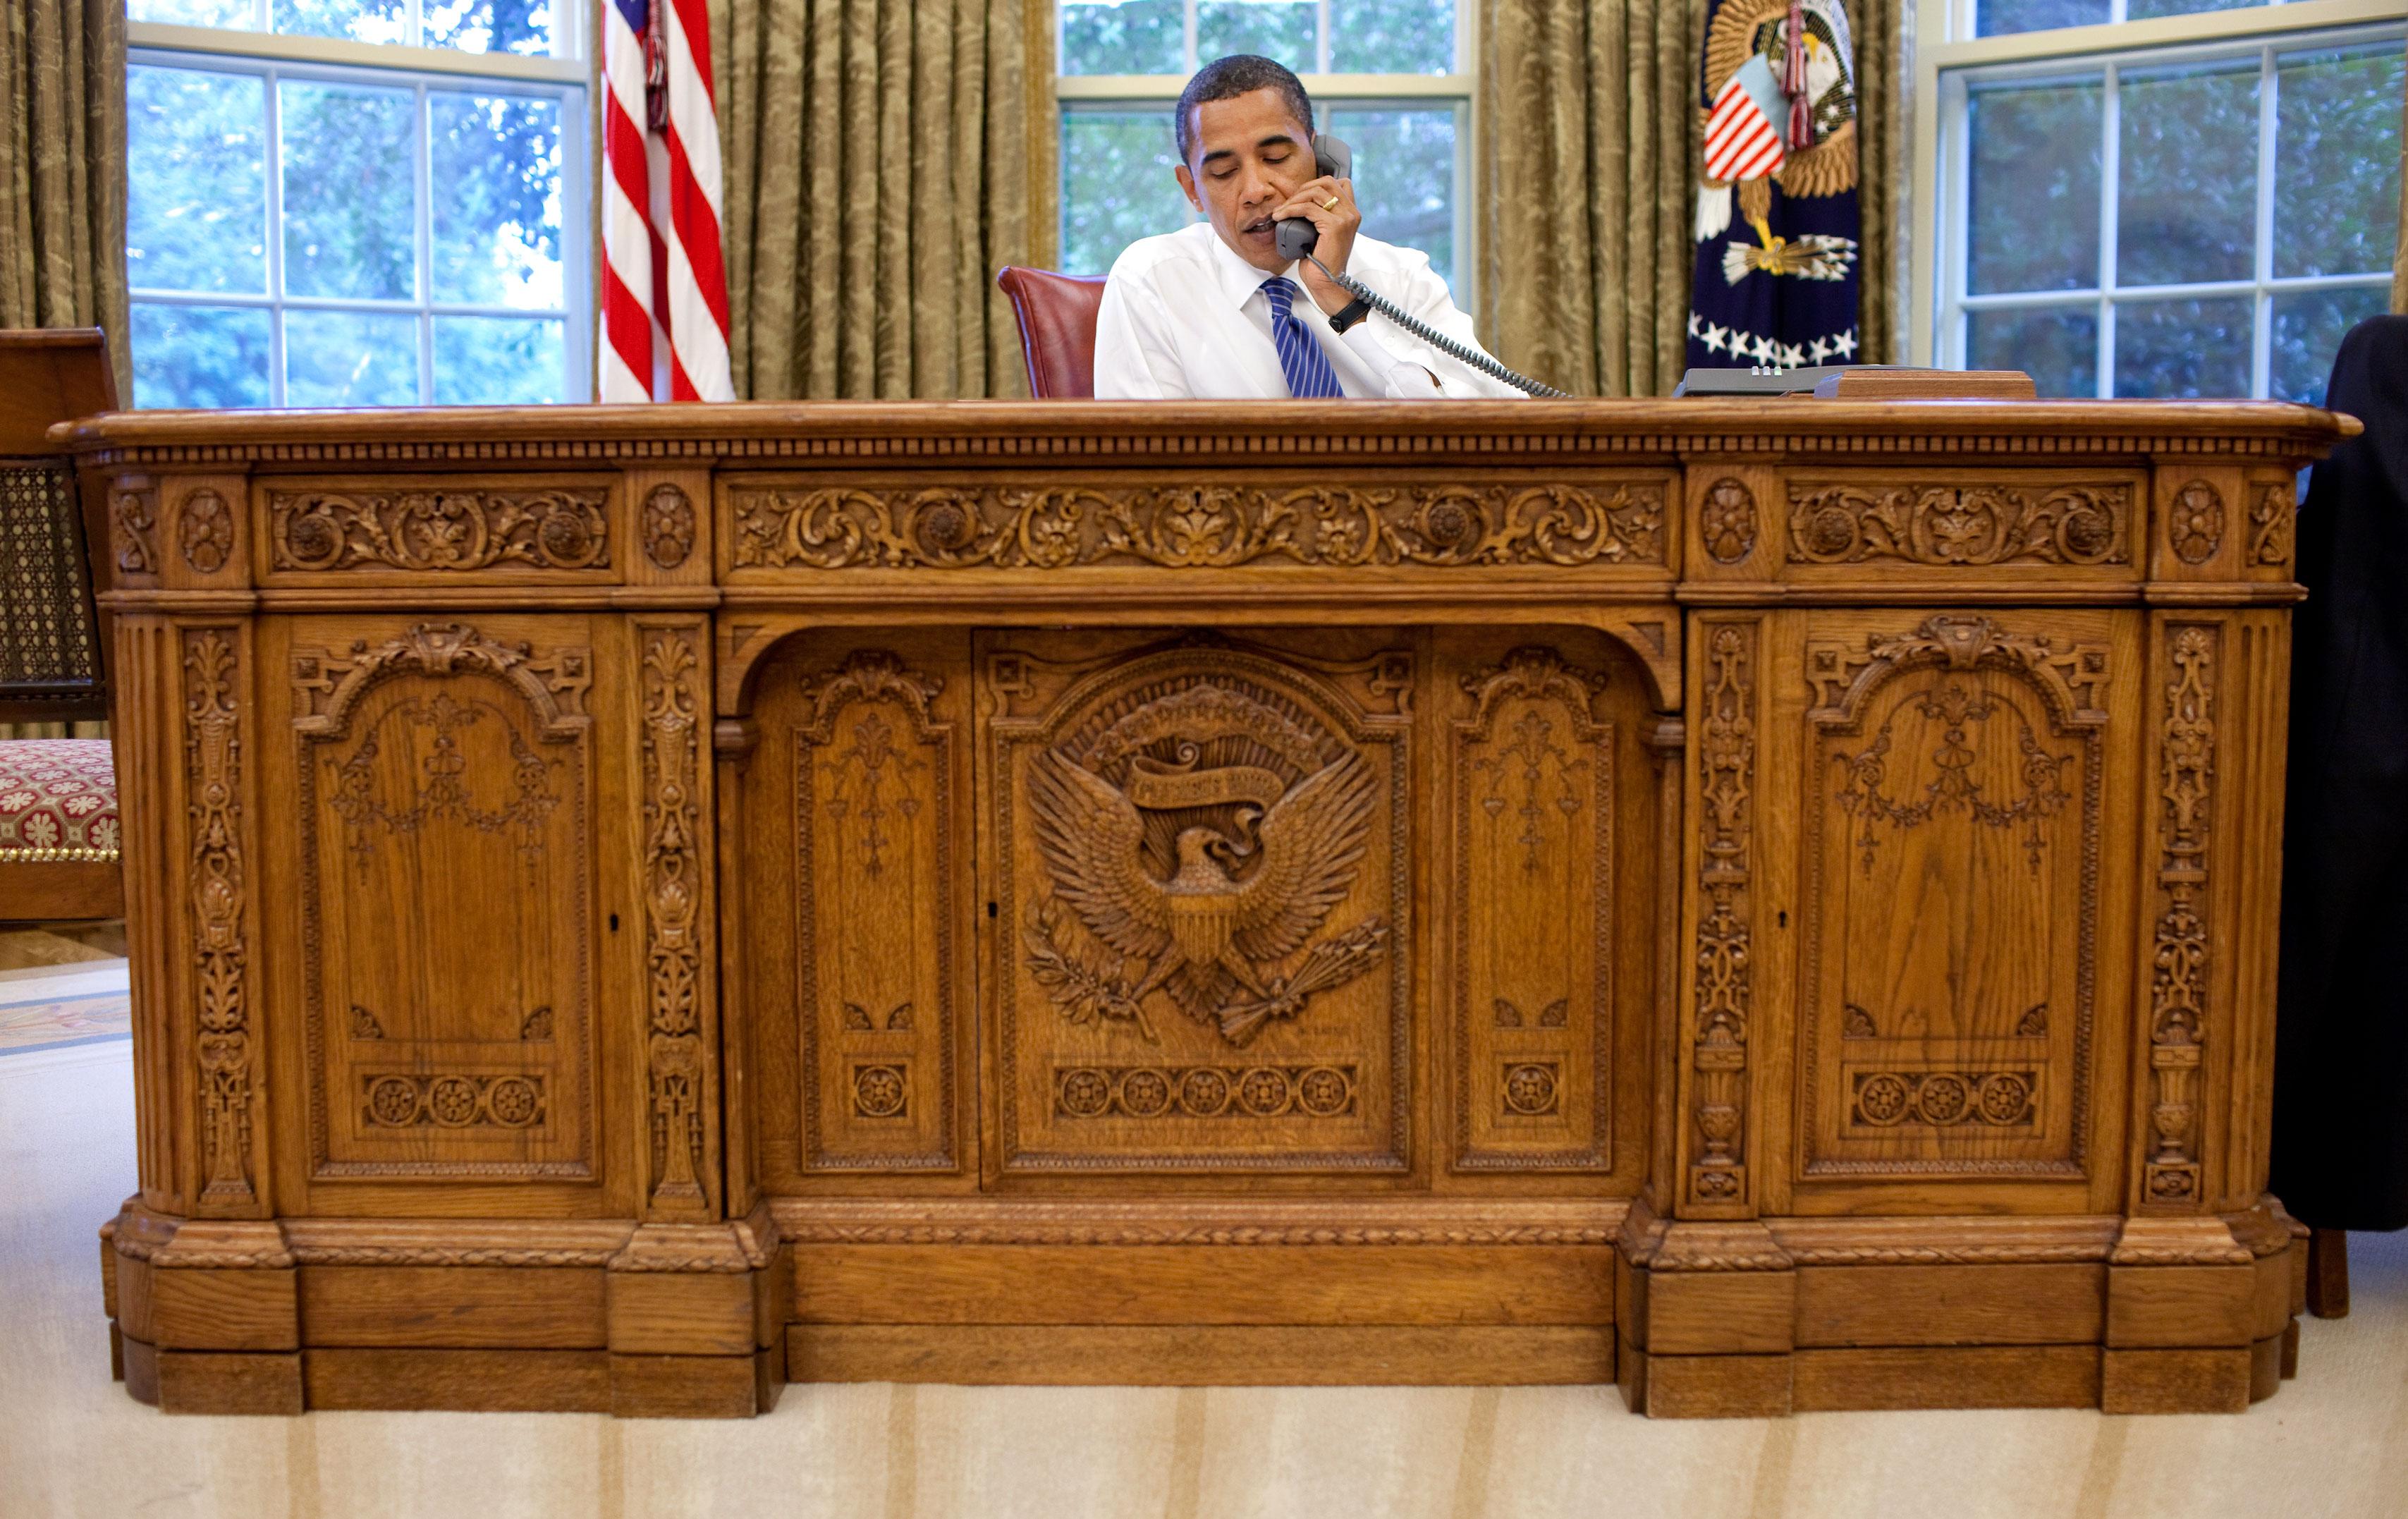 barack_obama_sitting_at_the_resolute_desk_2009.jpg